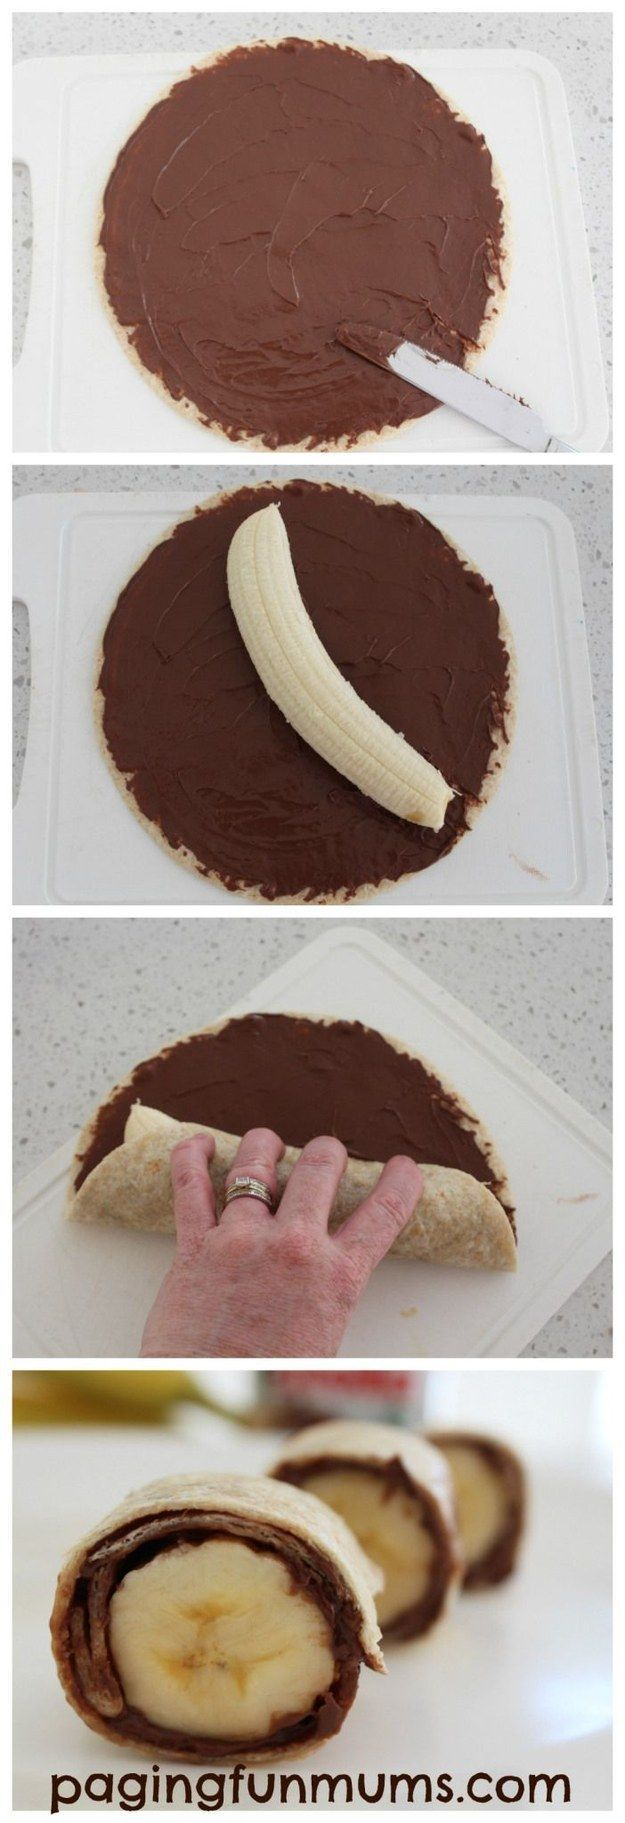 Nutella & Banana Sushi | 21 Back-To-School Breakfast Recipes That Kids Will Love